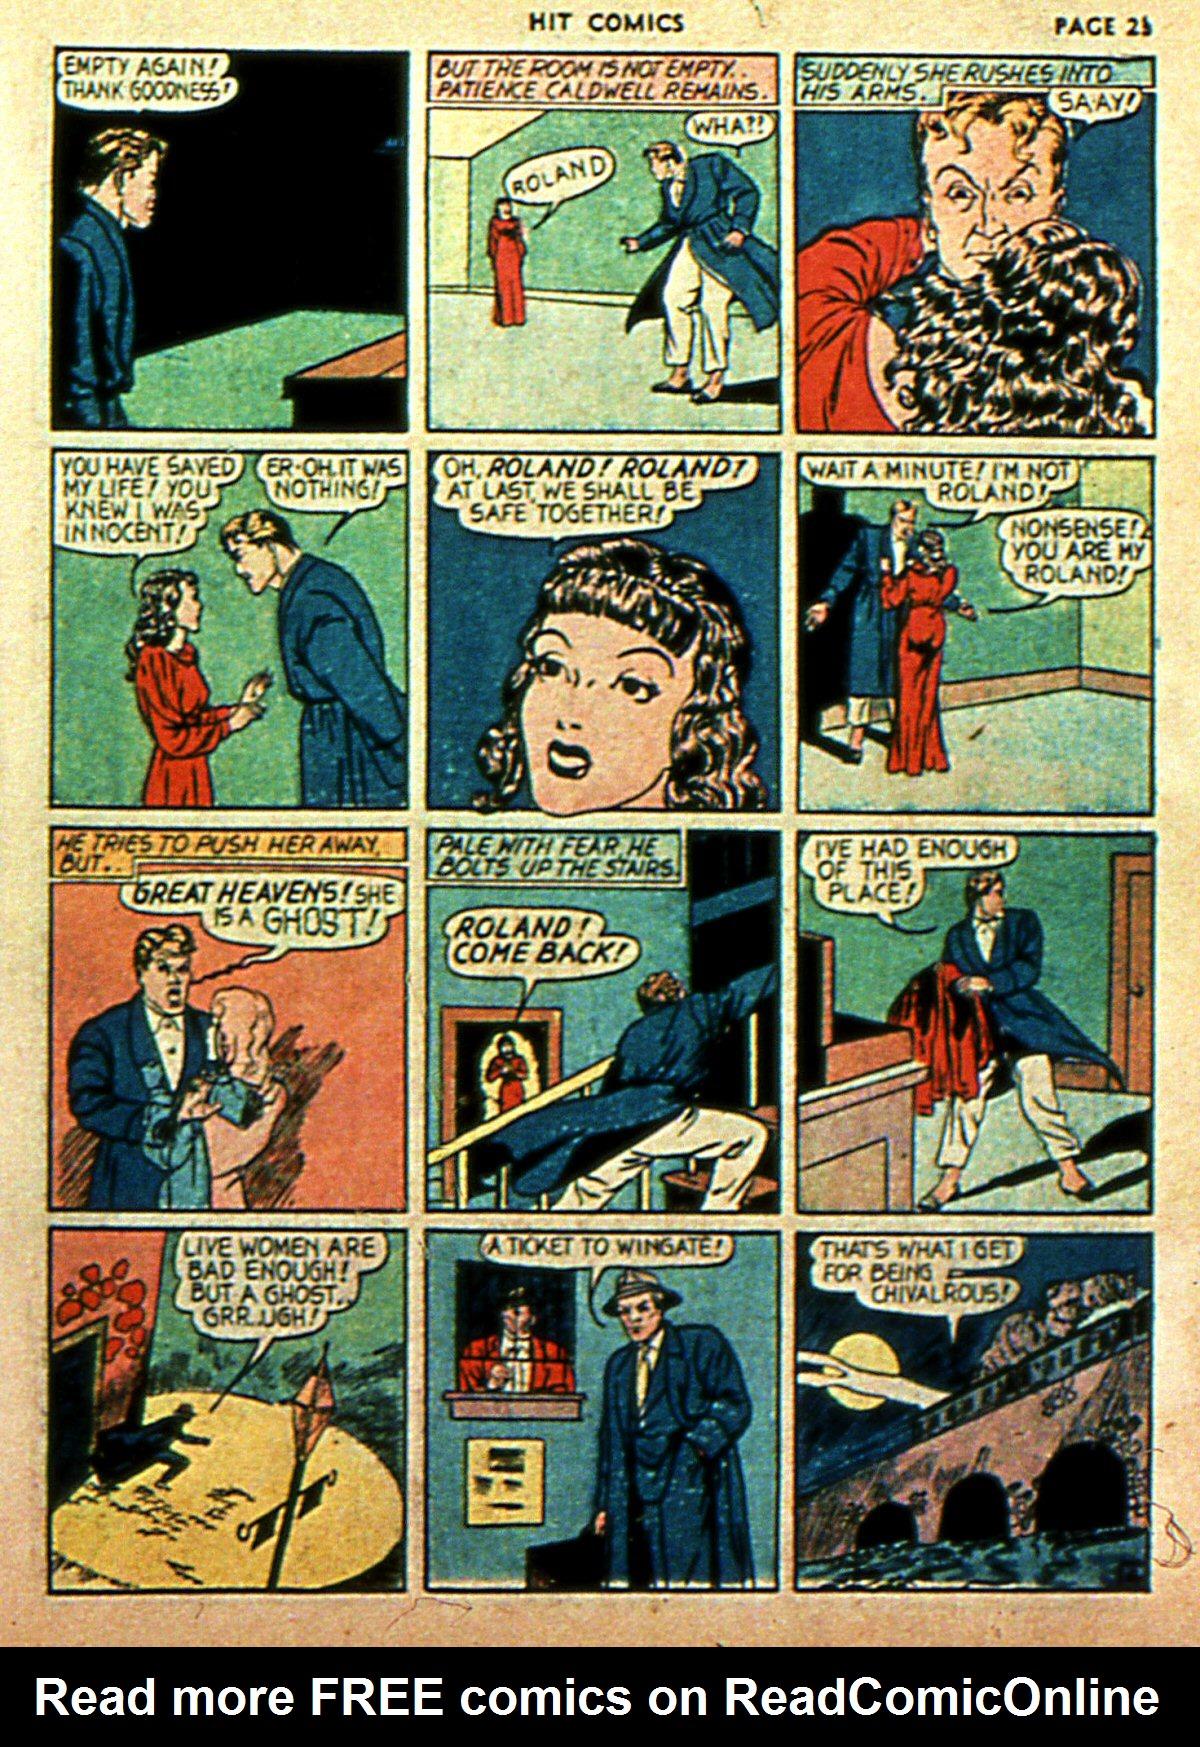 Read online Hit Comics comic -  Issue #2 - 25